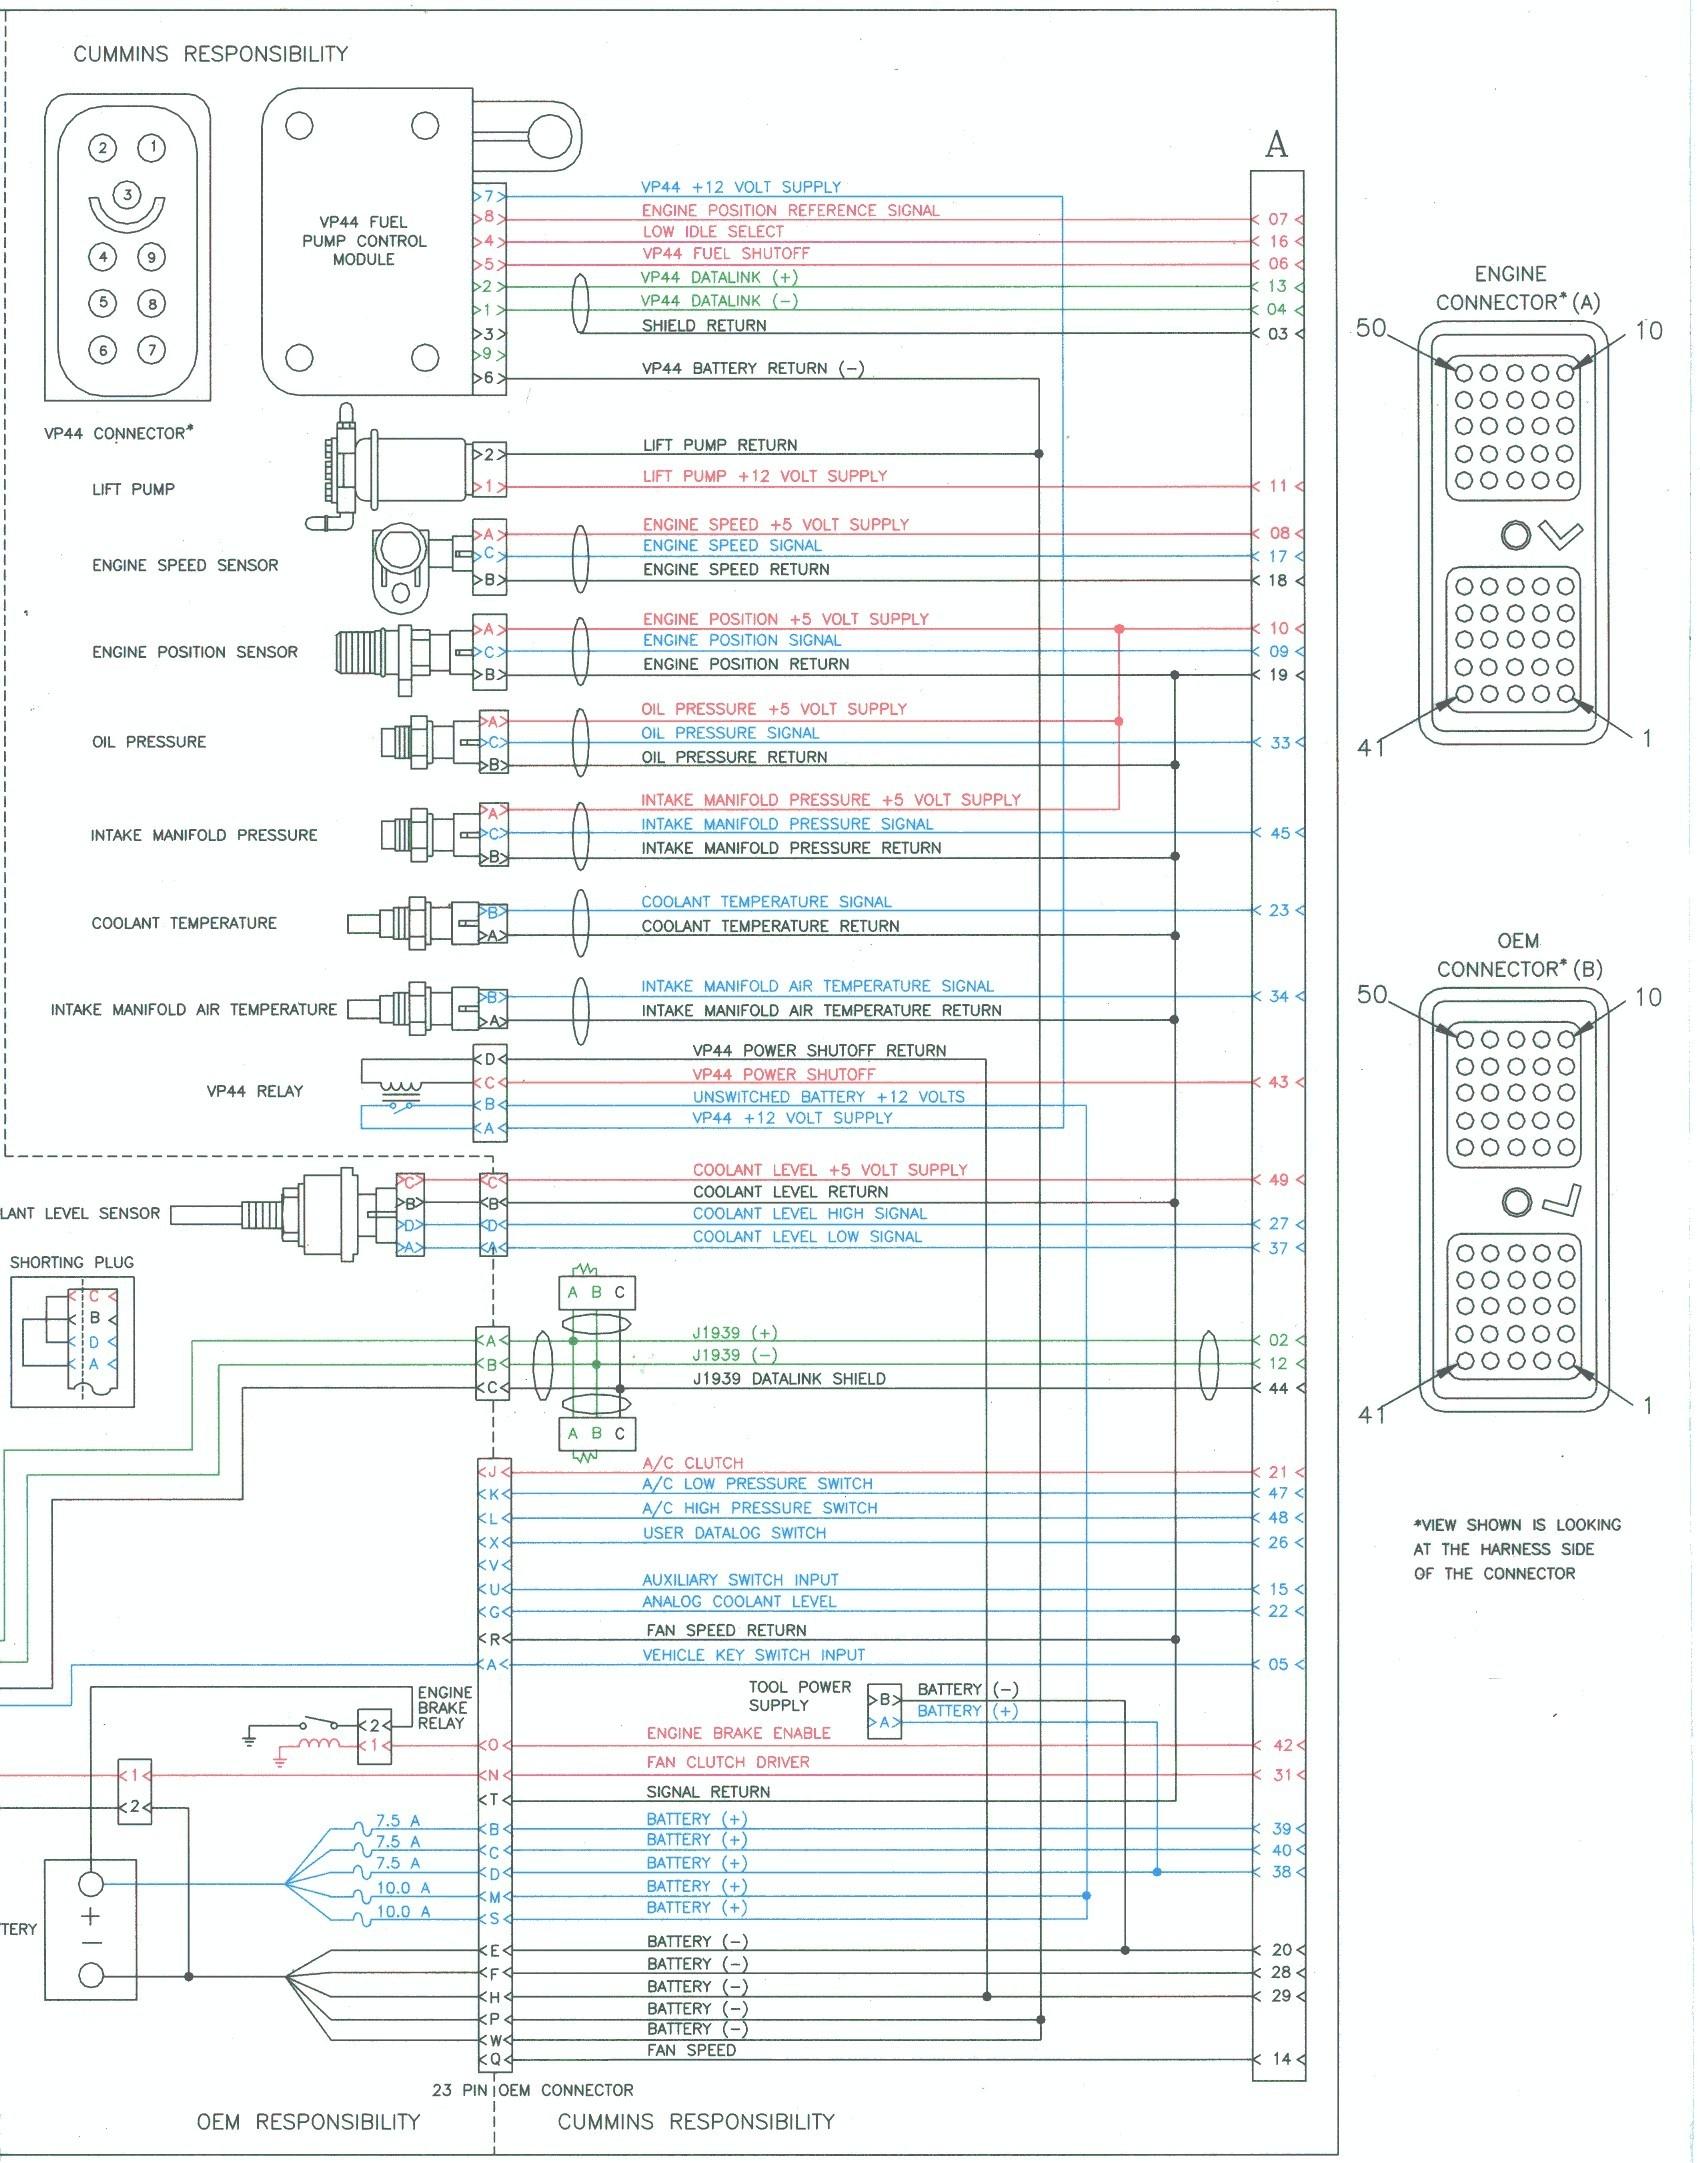 2005 Dodge Cummins Ecm Wiring Diagram